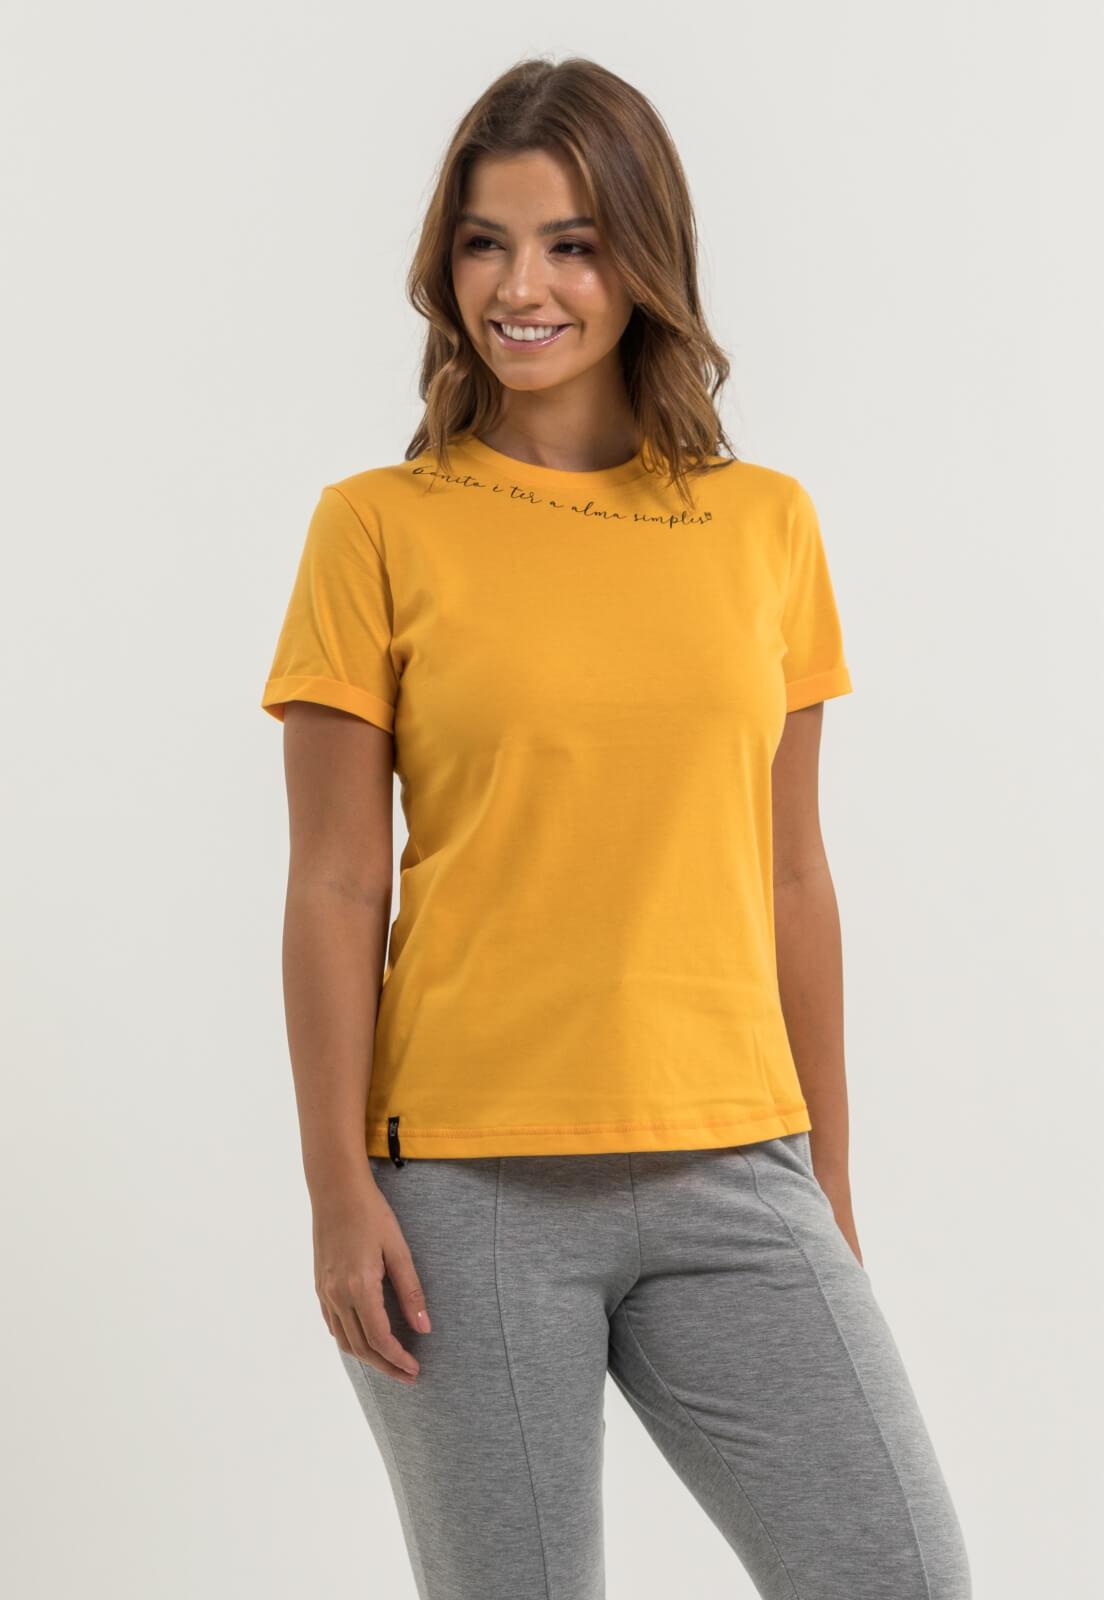 T-shirt Nogah Alma Simples Ouro